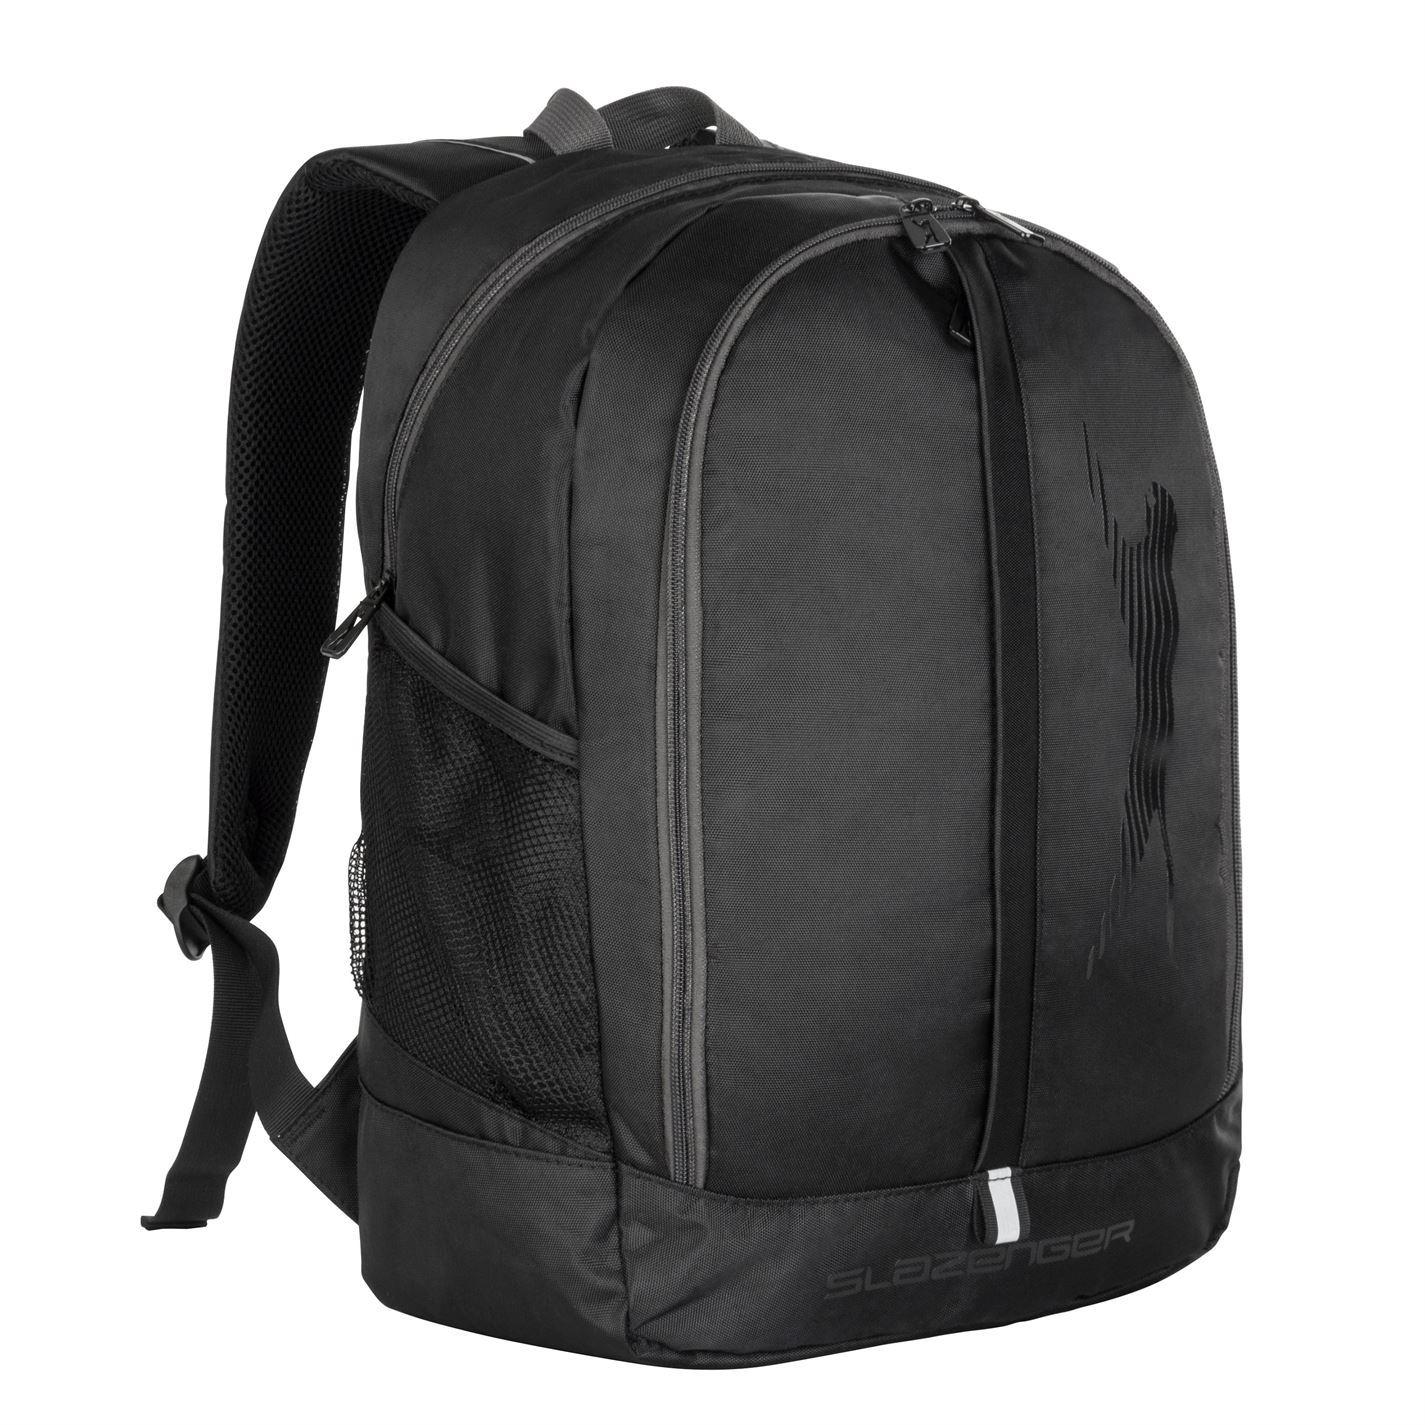 Slazenger Ace Sports Backpack Black Bag Gymbag Rucksack